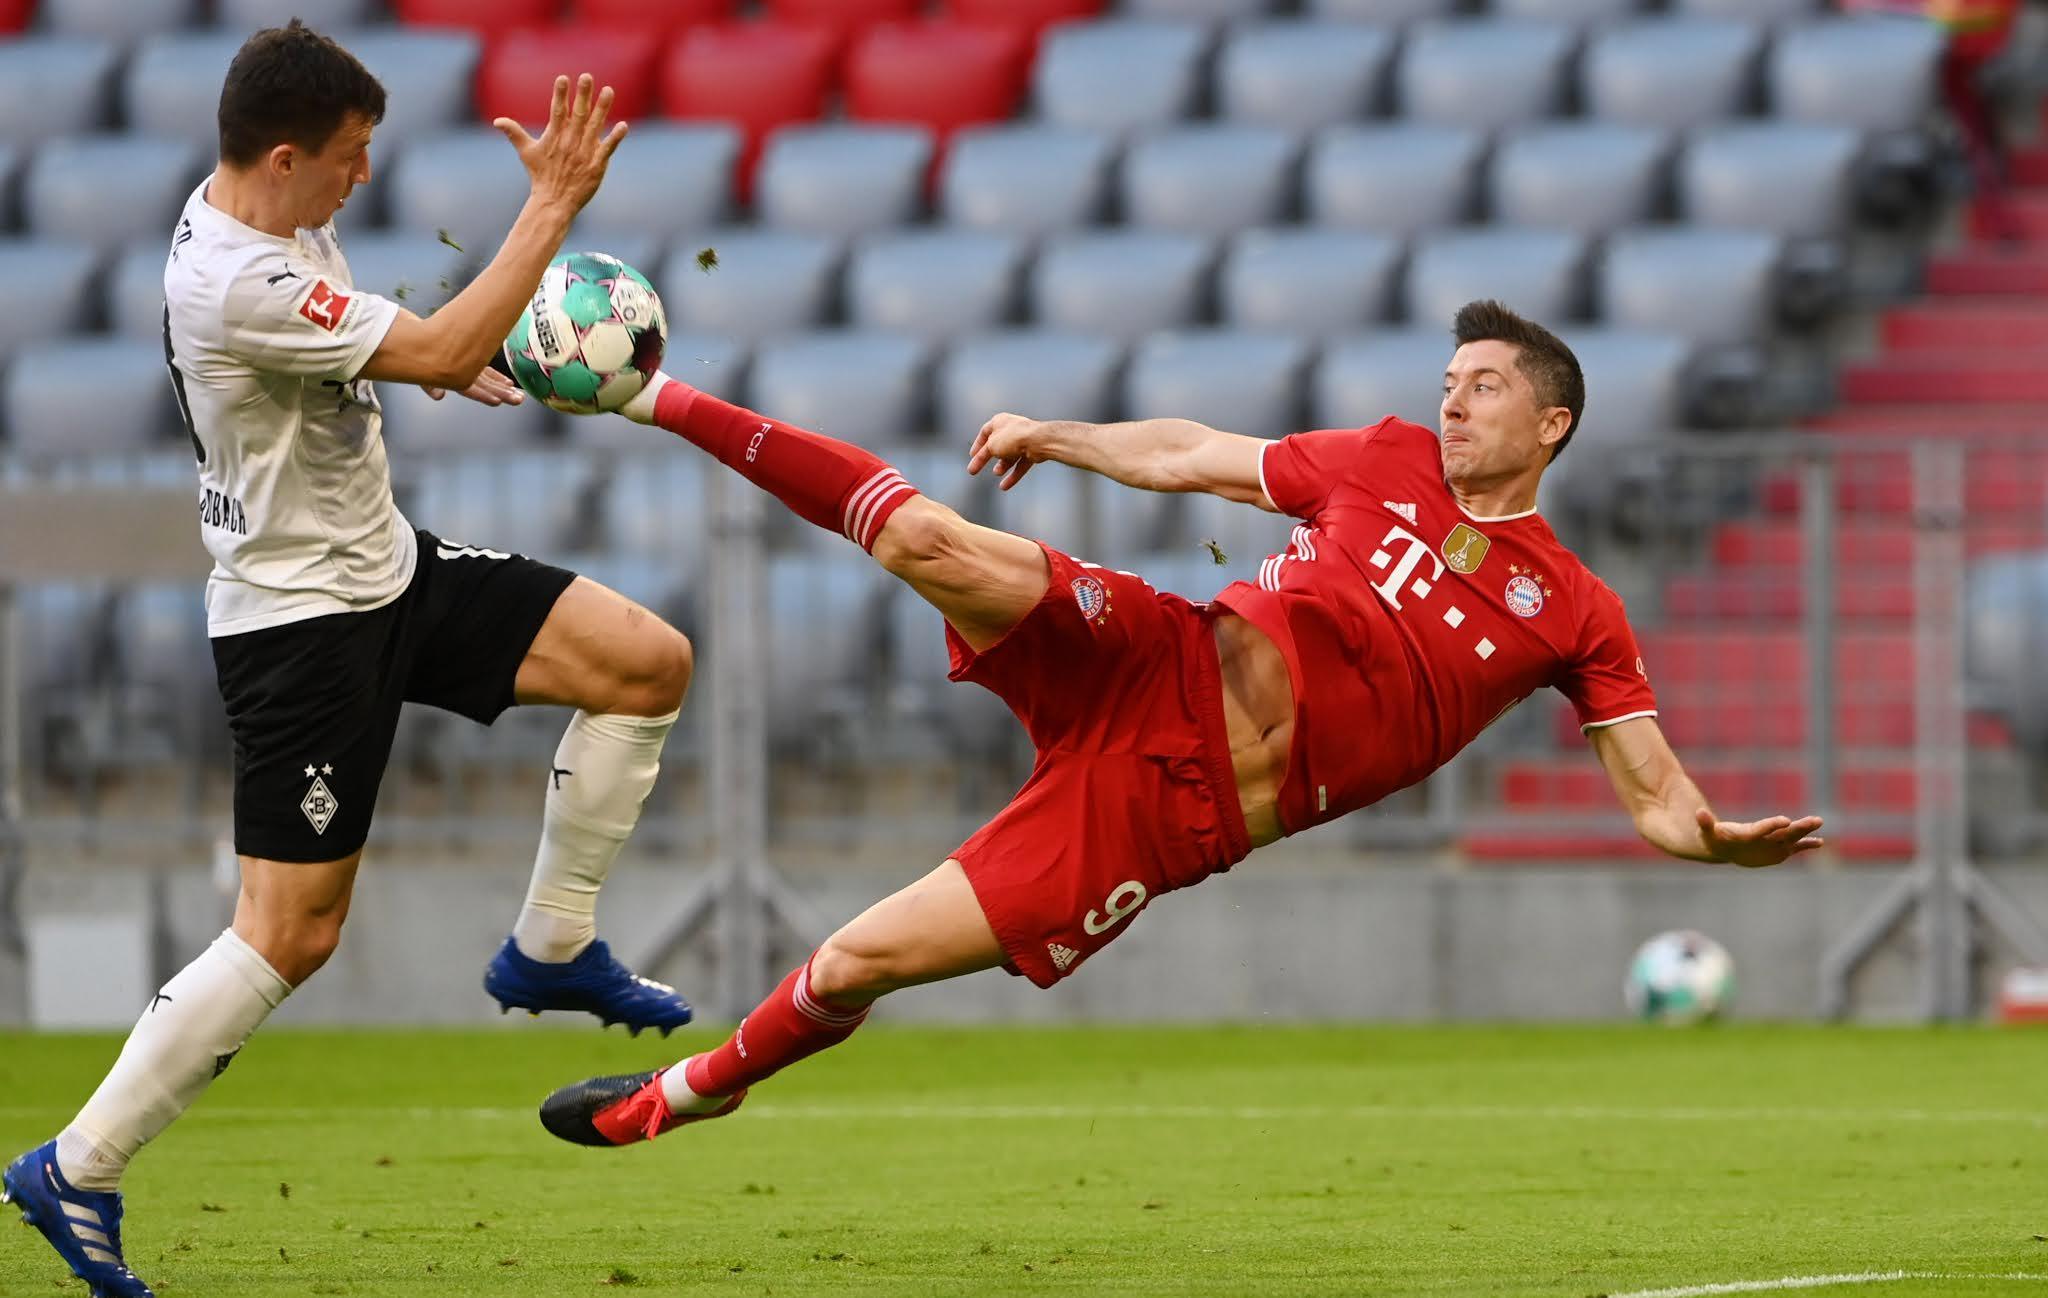 Robert Lewandowski's next target is to break the record for most goals scored in a single Bundesliga season